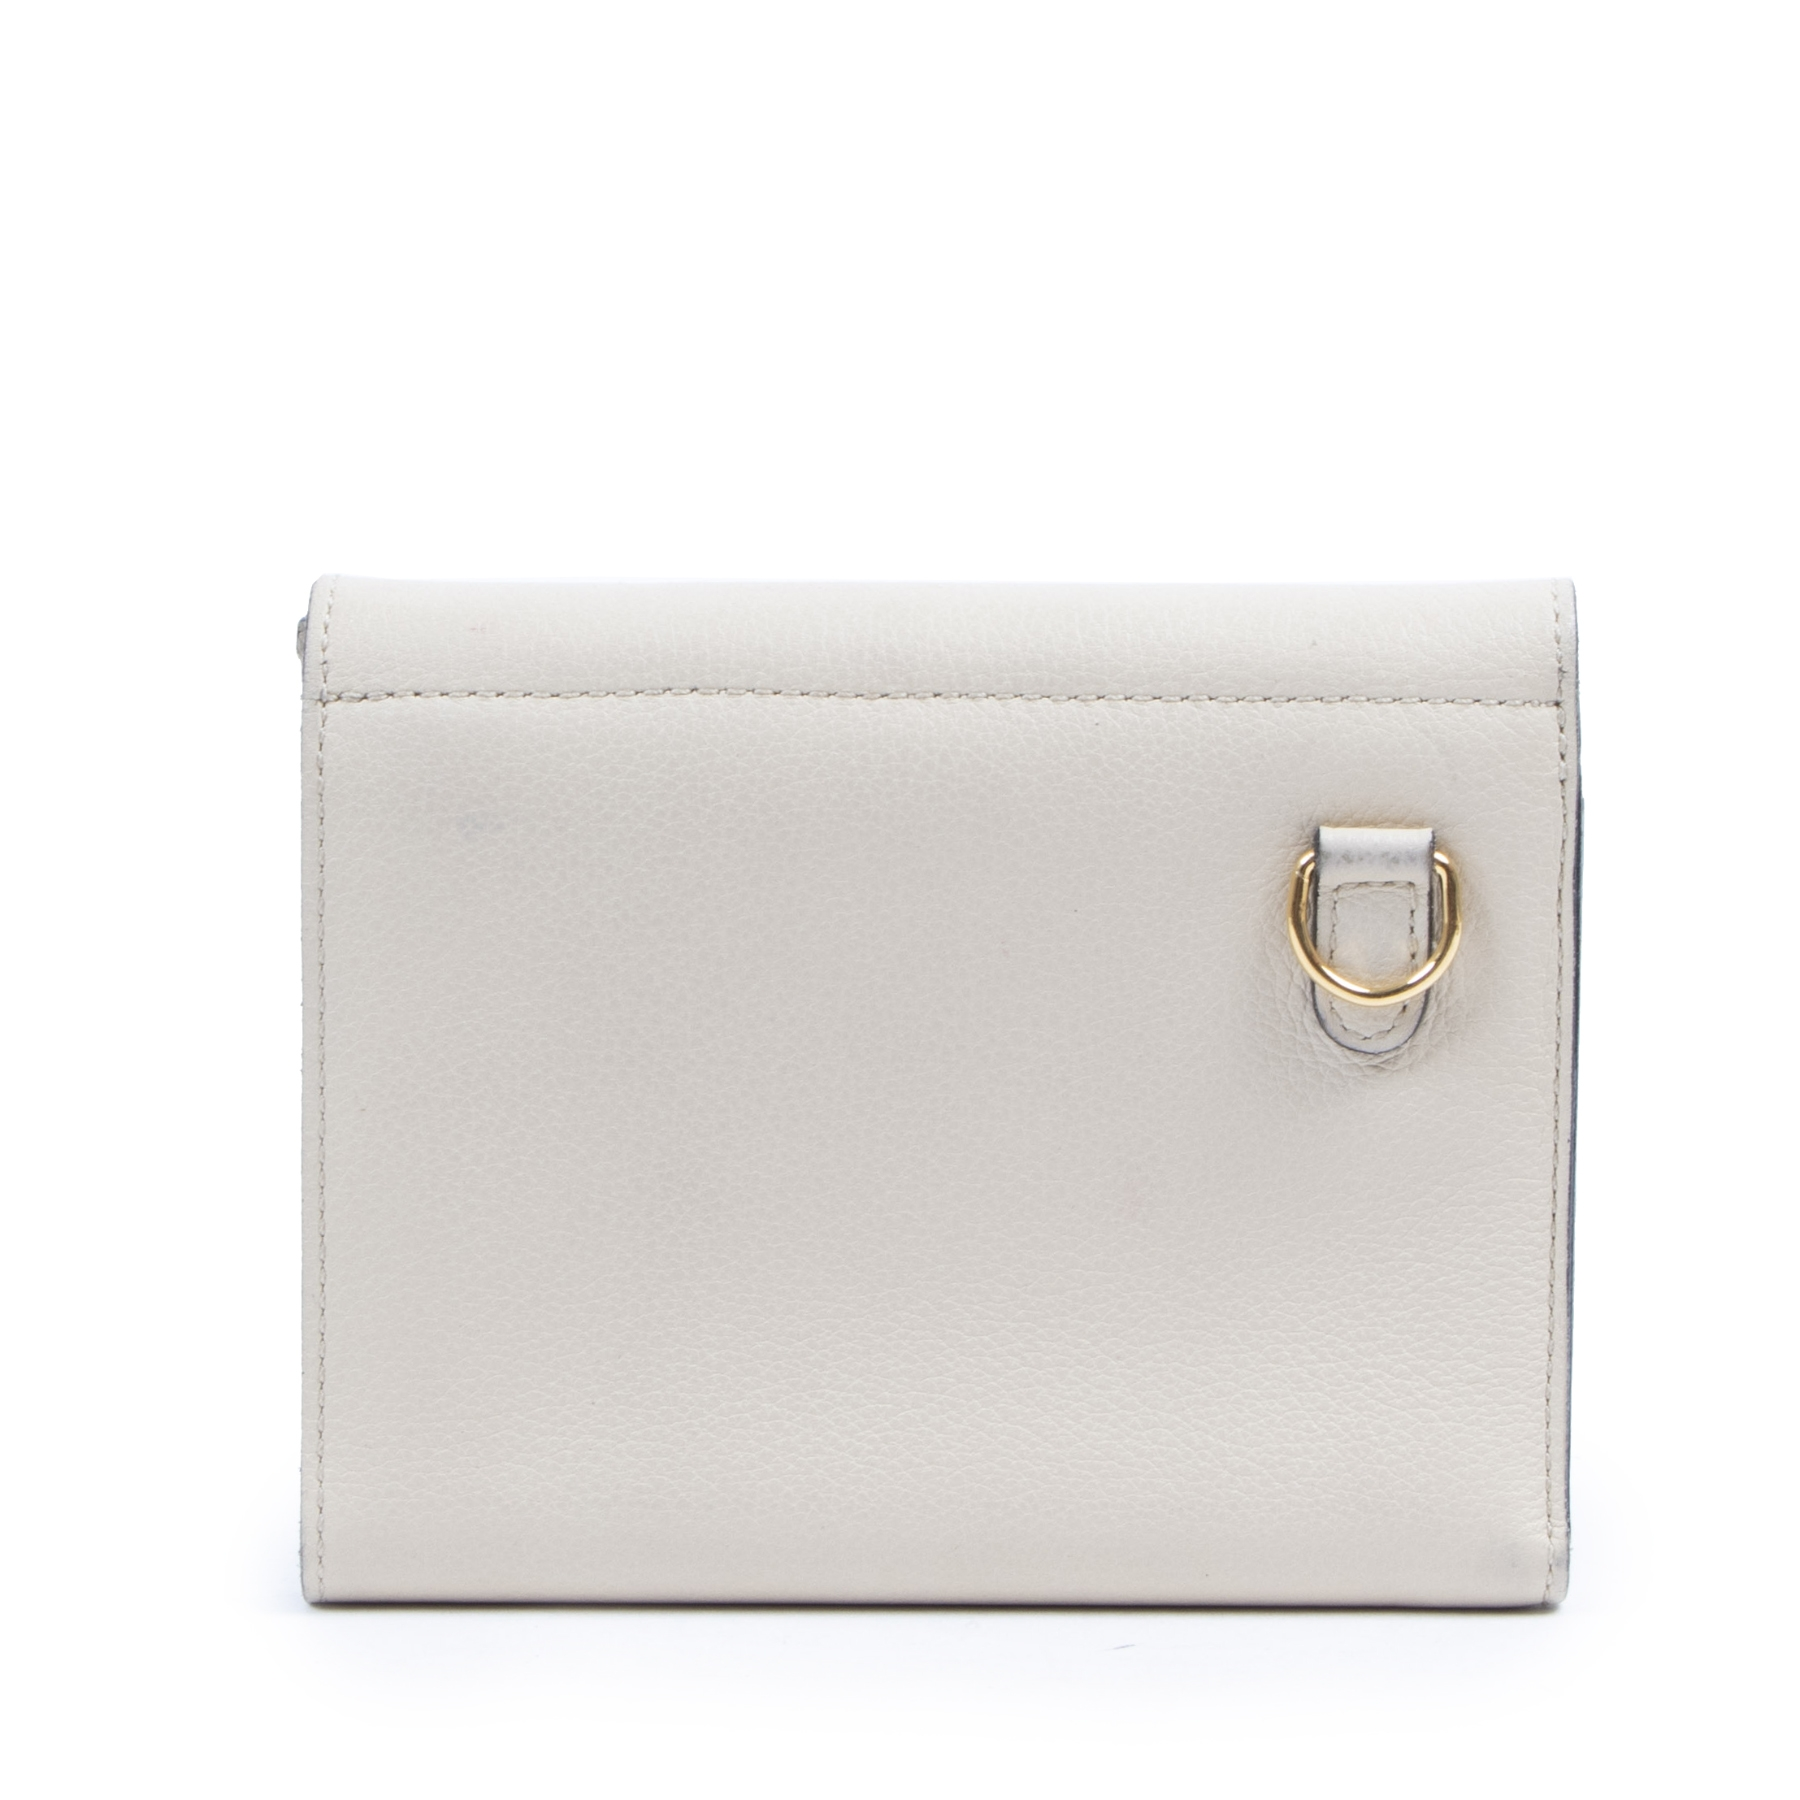 Authentieke tweedehands vintage Delvaux Cream Leather Wallet koop online webshop LabelLOV